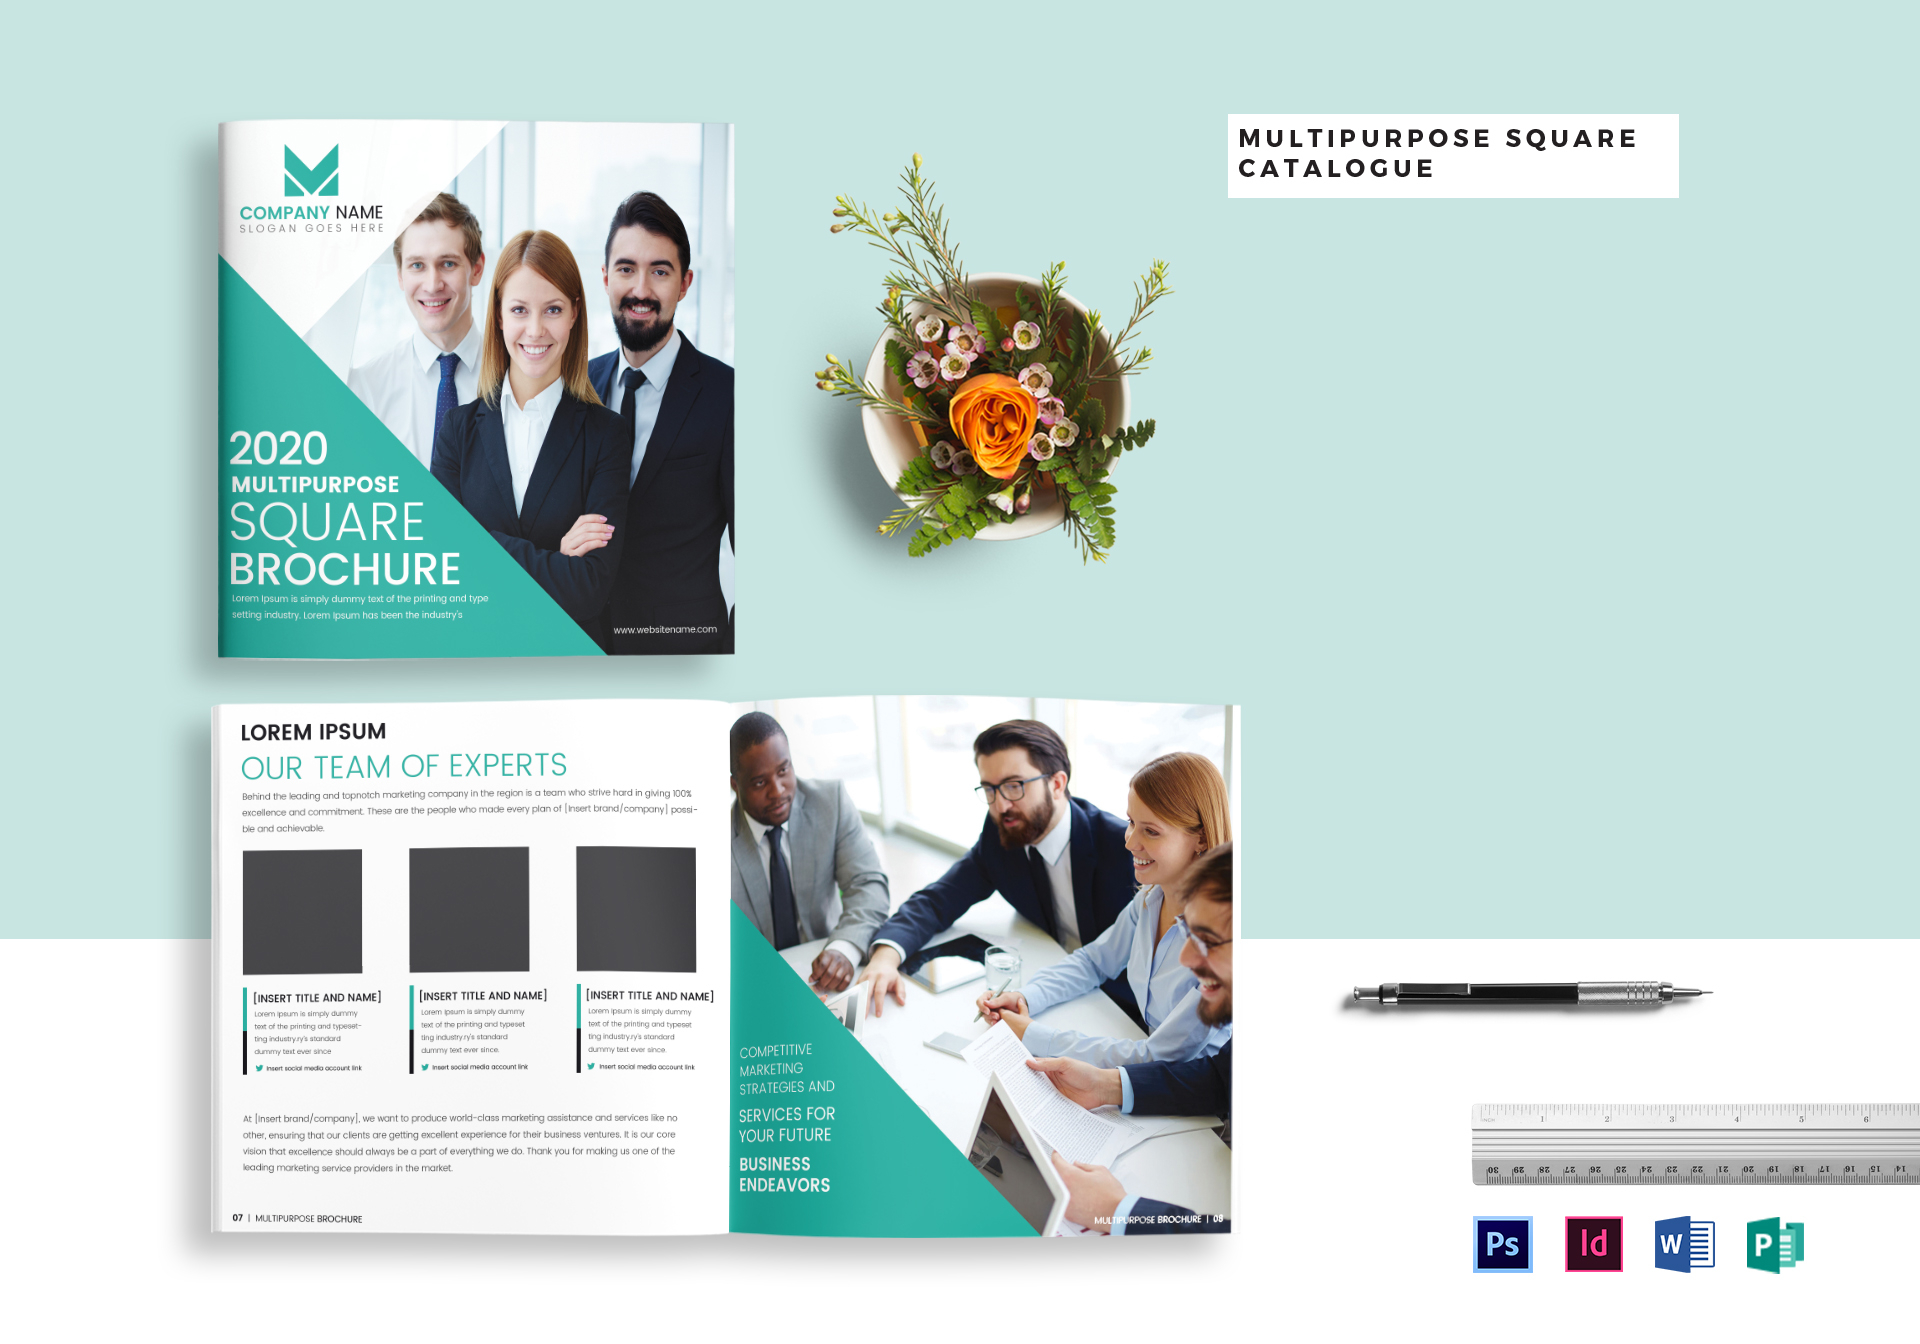 Multipurpose Square Brochure Catalog Template